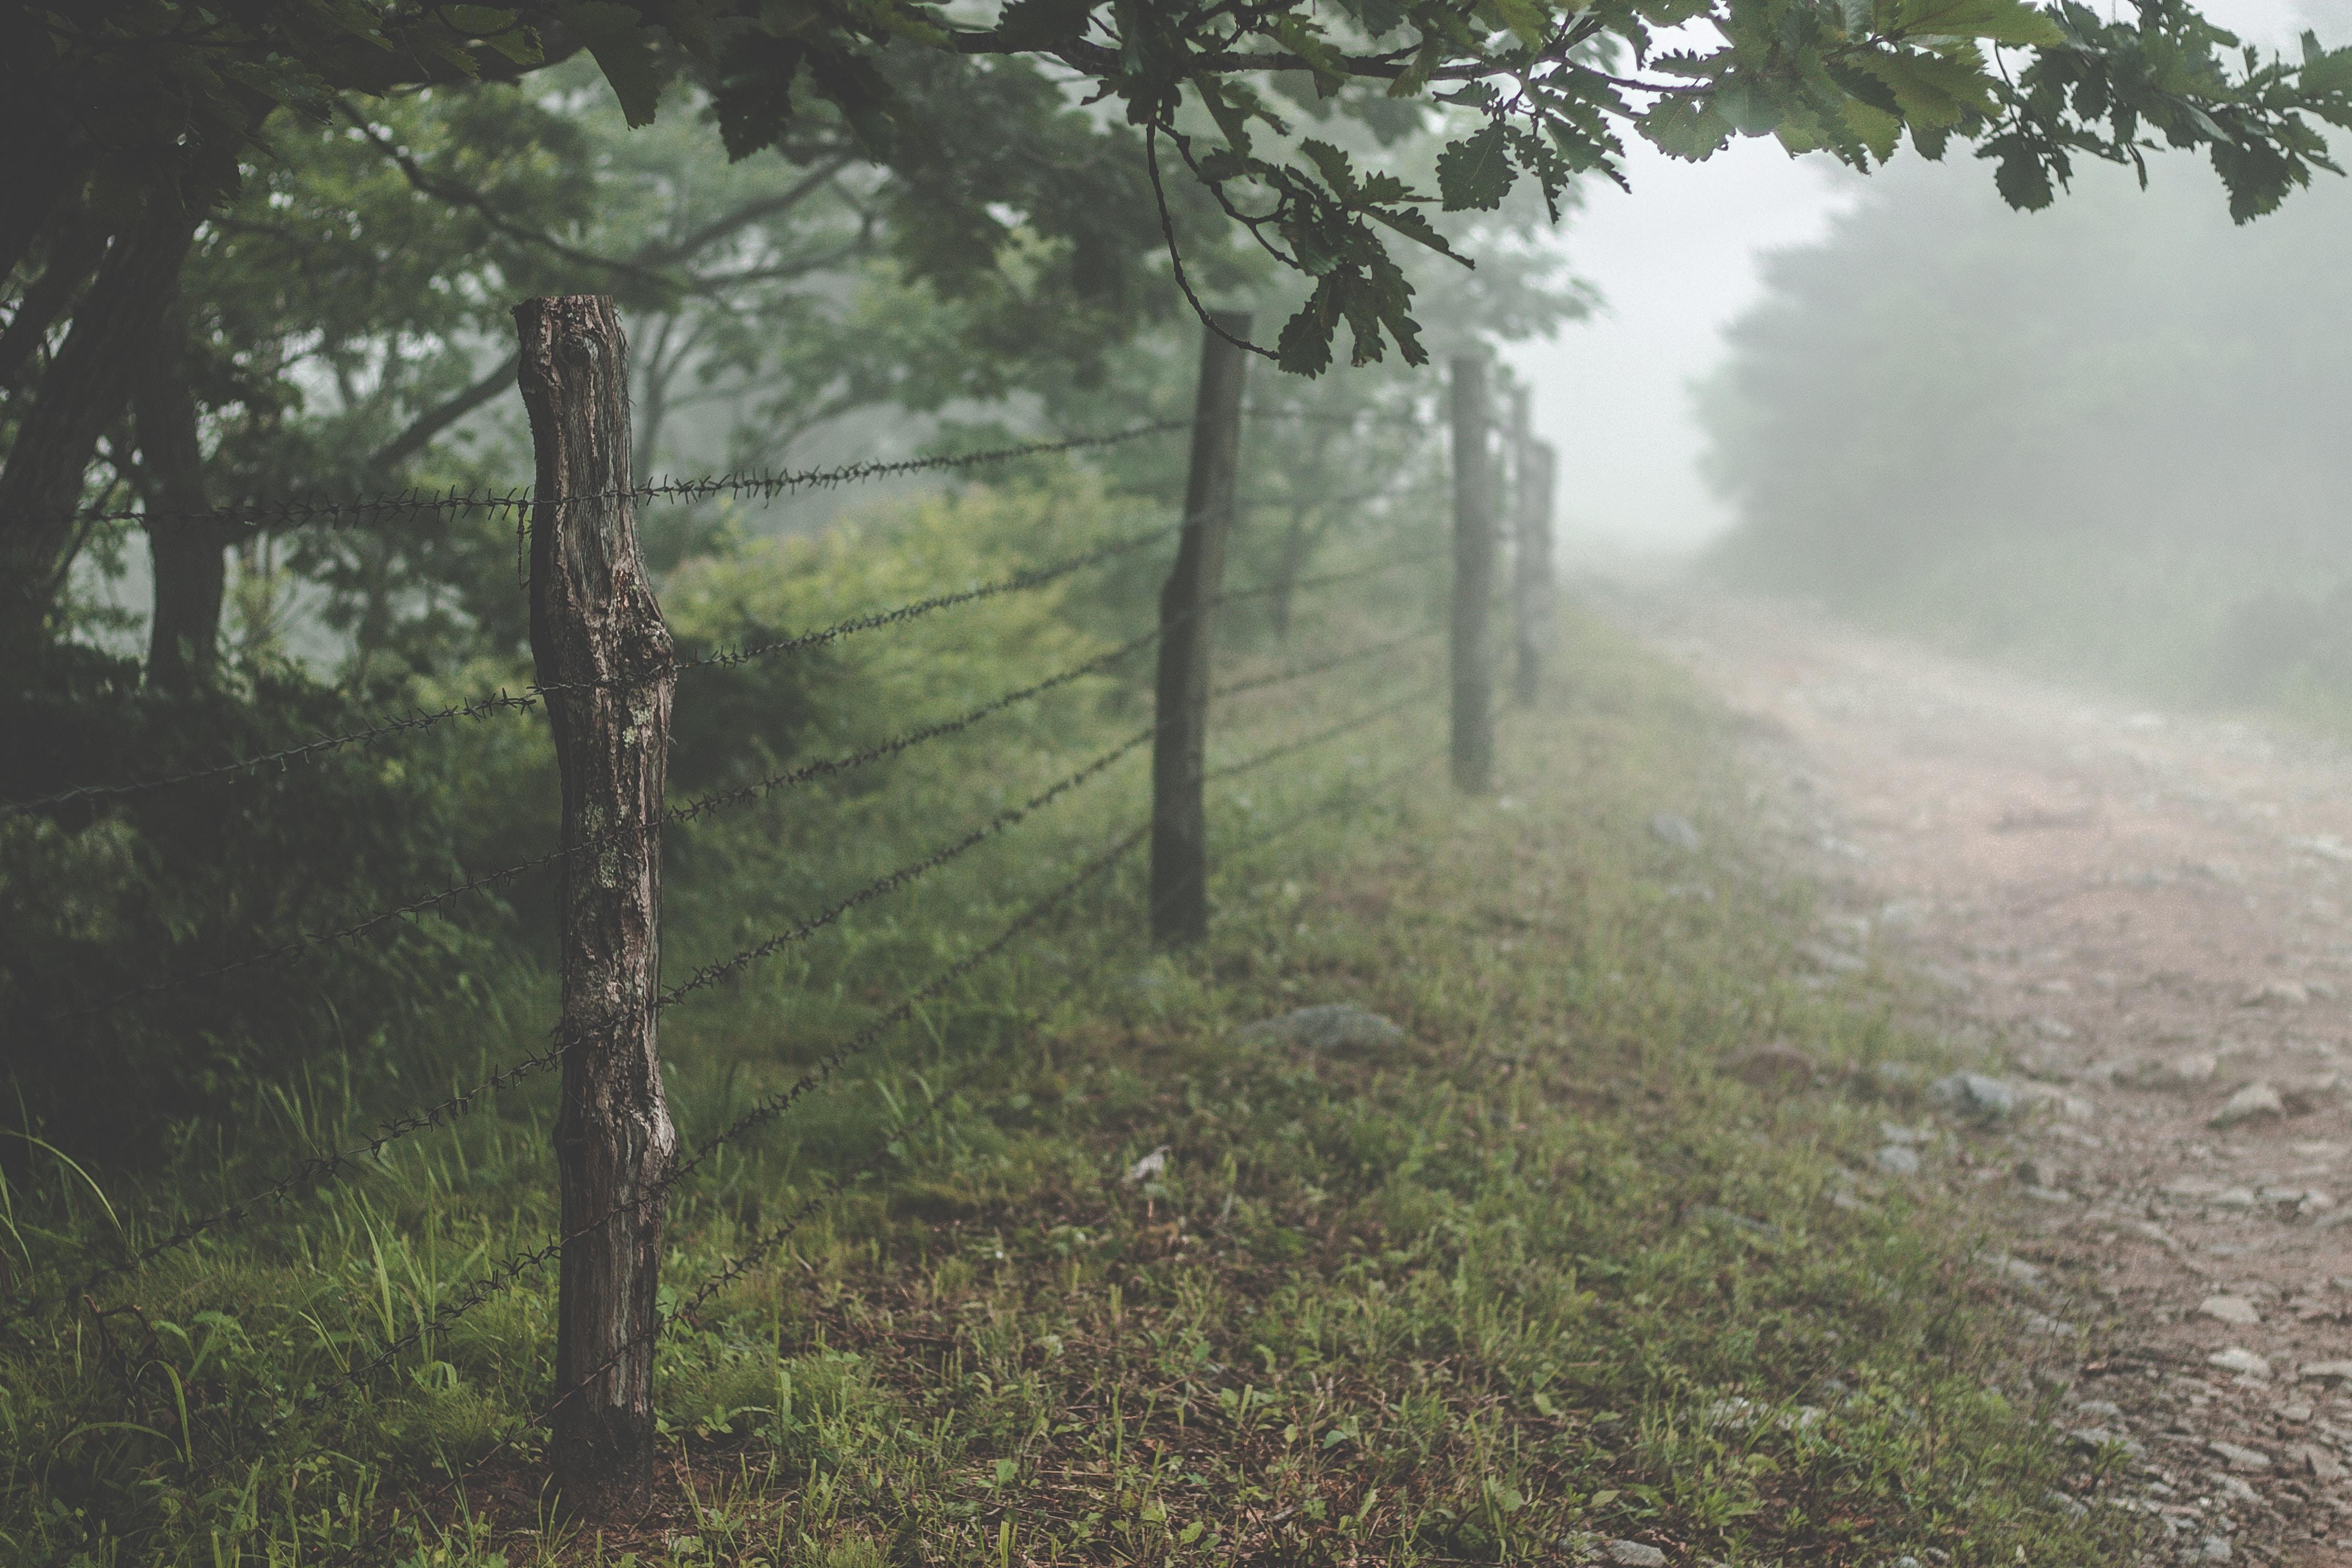 landscape photo of foggy trees